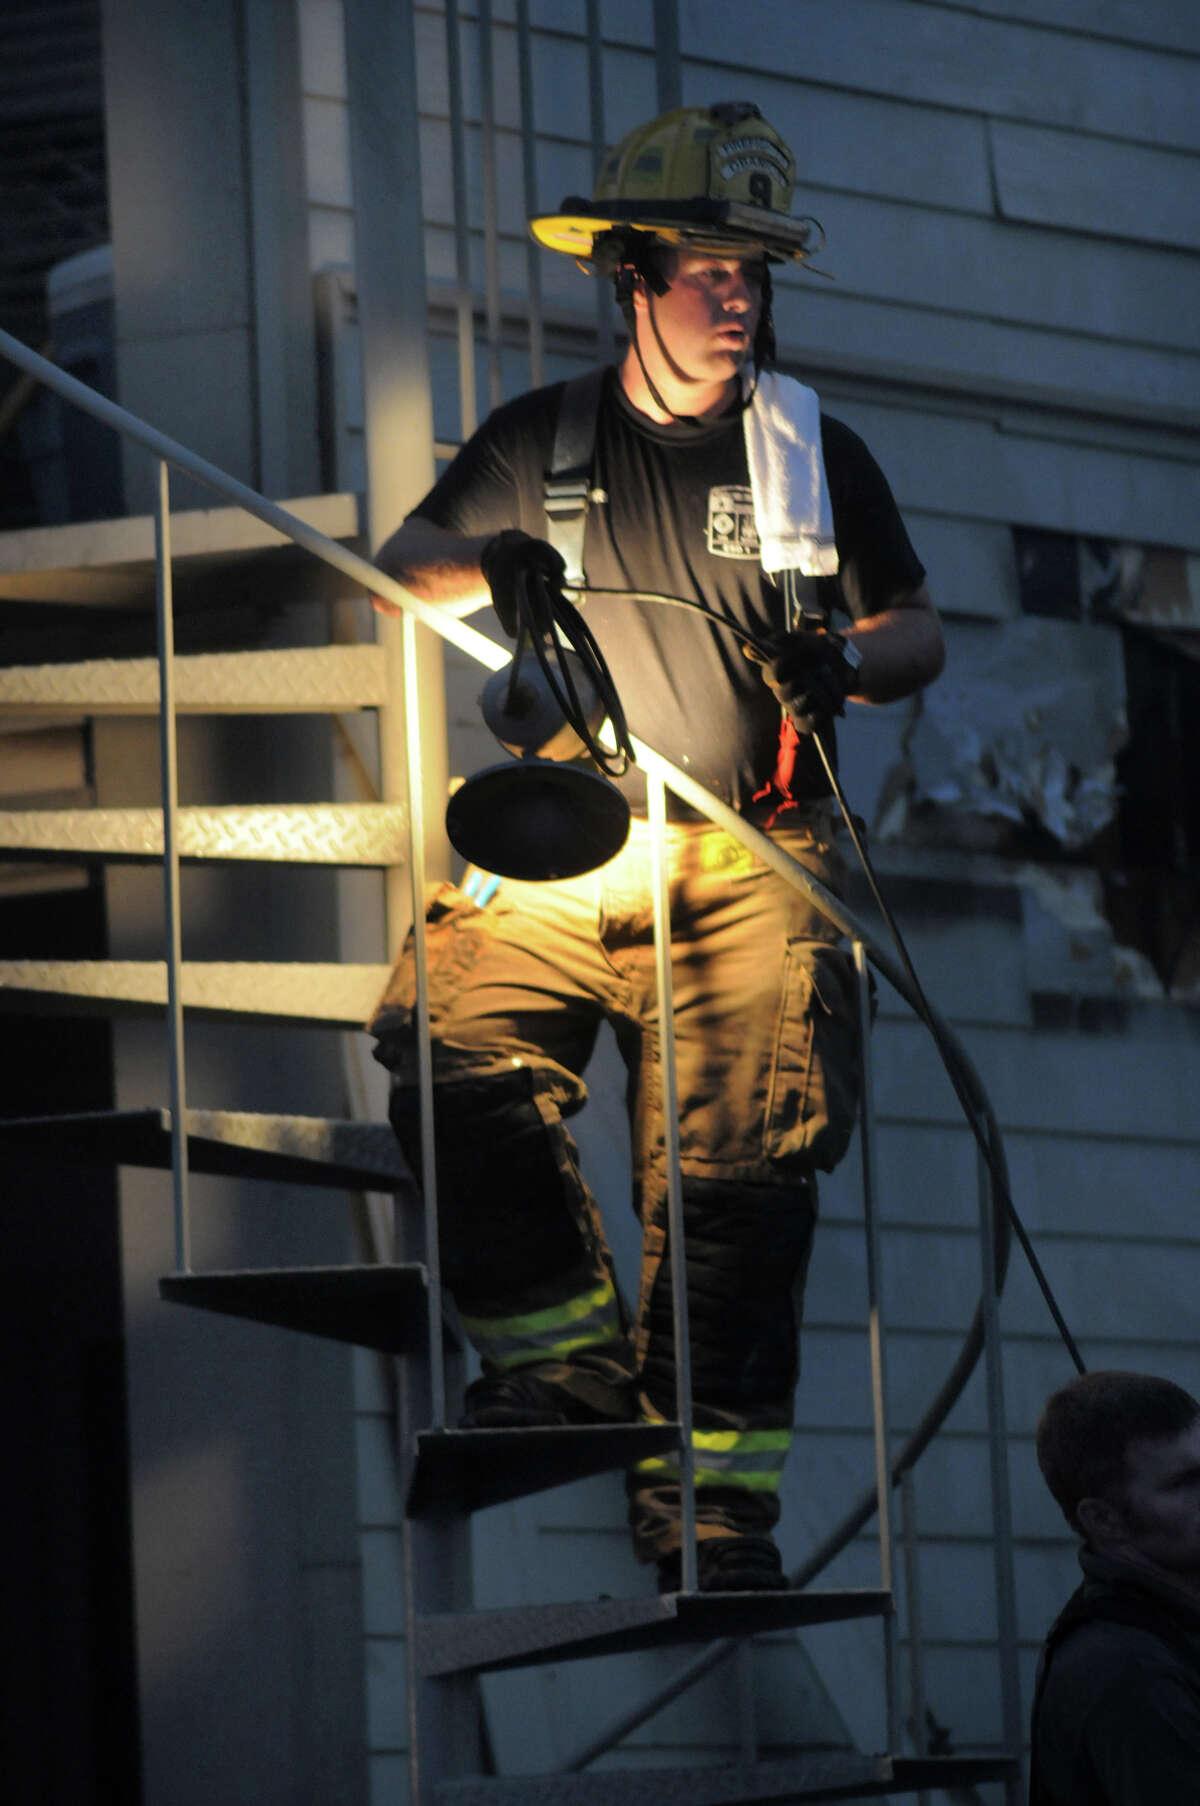 April Sound Condominiums in Conroe was the scene of a four-alarm fire on Saturday.